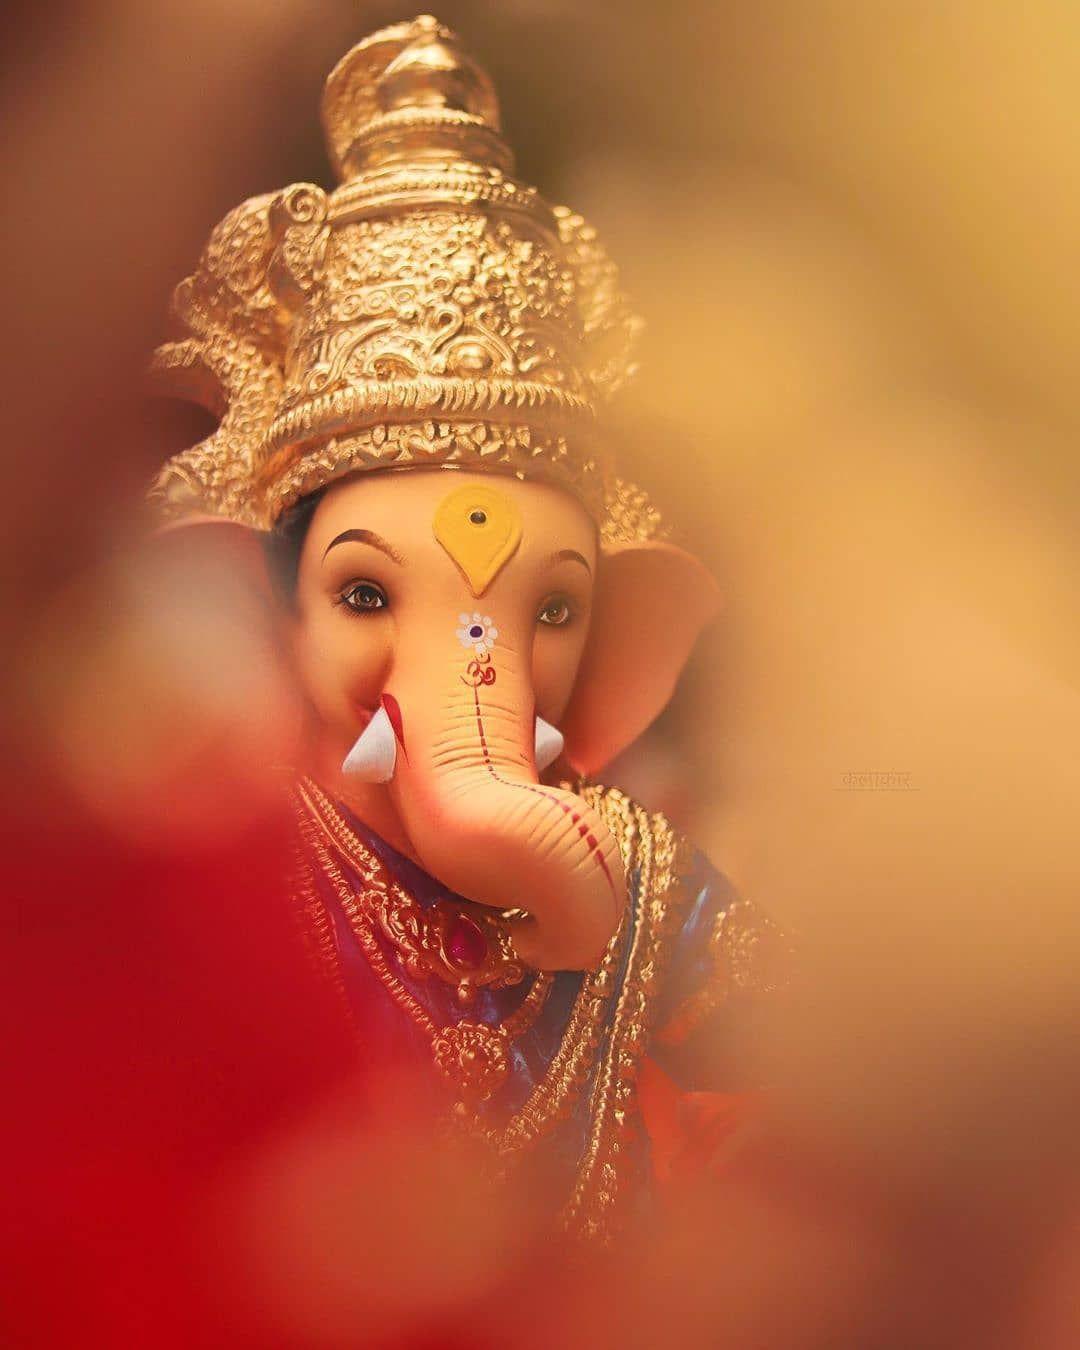 Pin On Ganesha Ganpati bappa images hd wallpaper